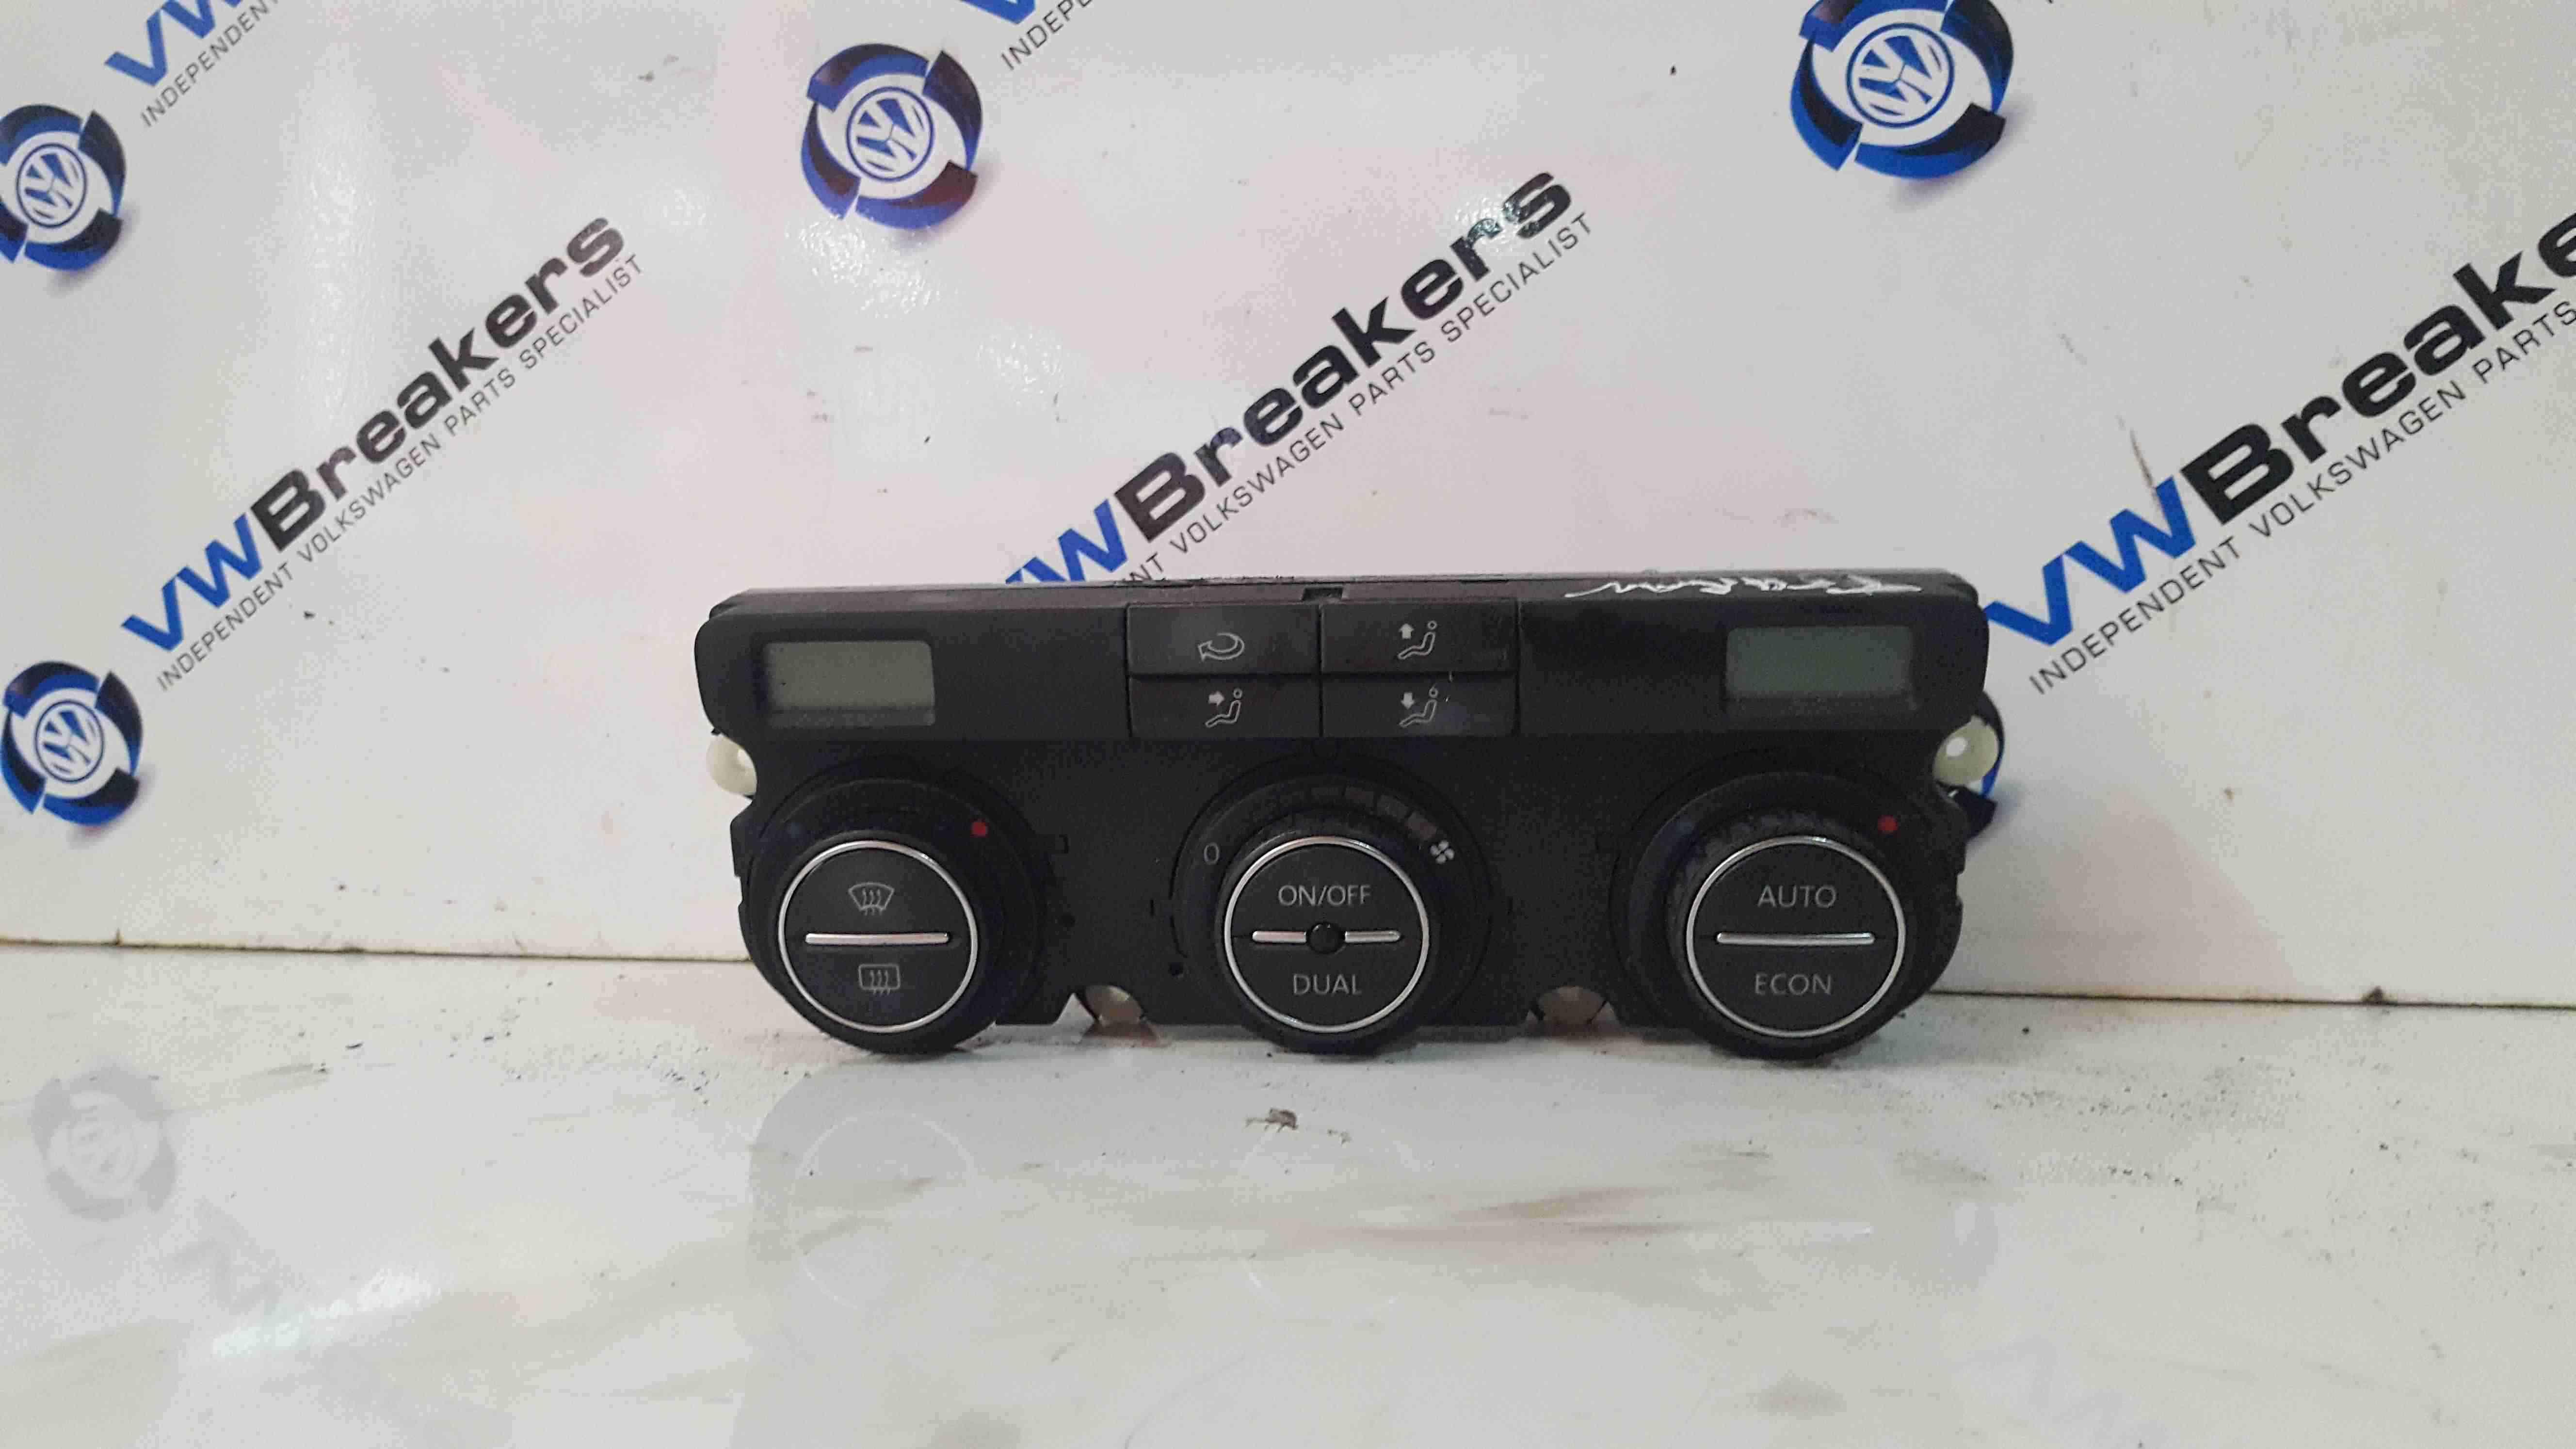 Volkswagen Touran 2003-2006 Climate Control Heater Controls